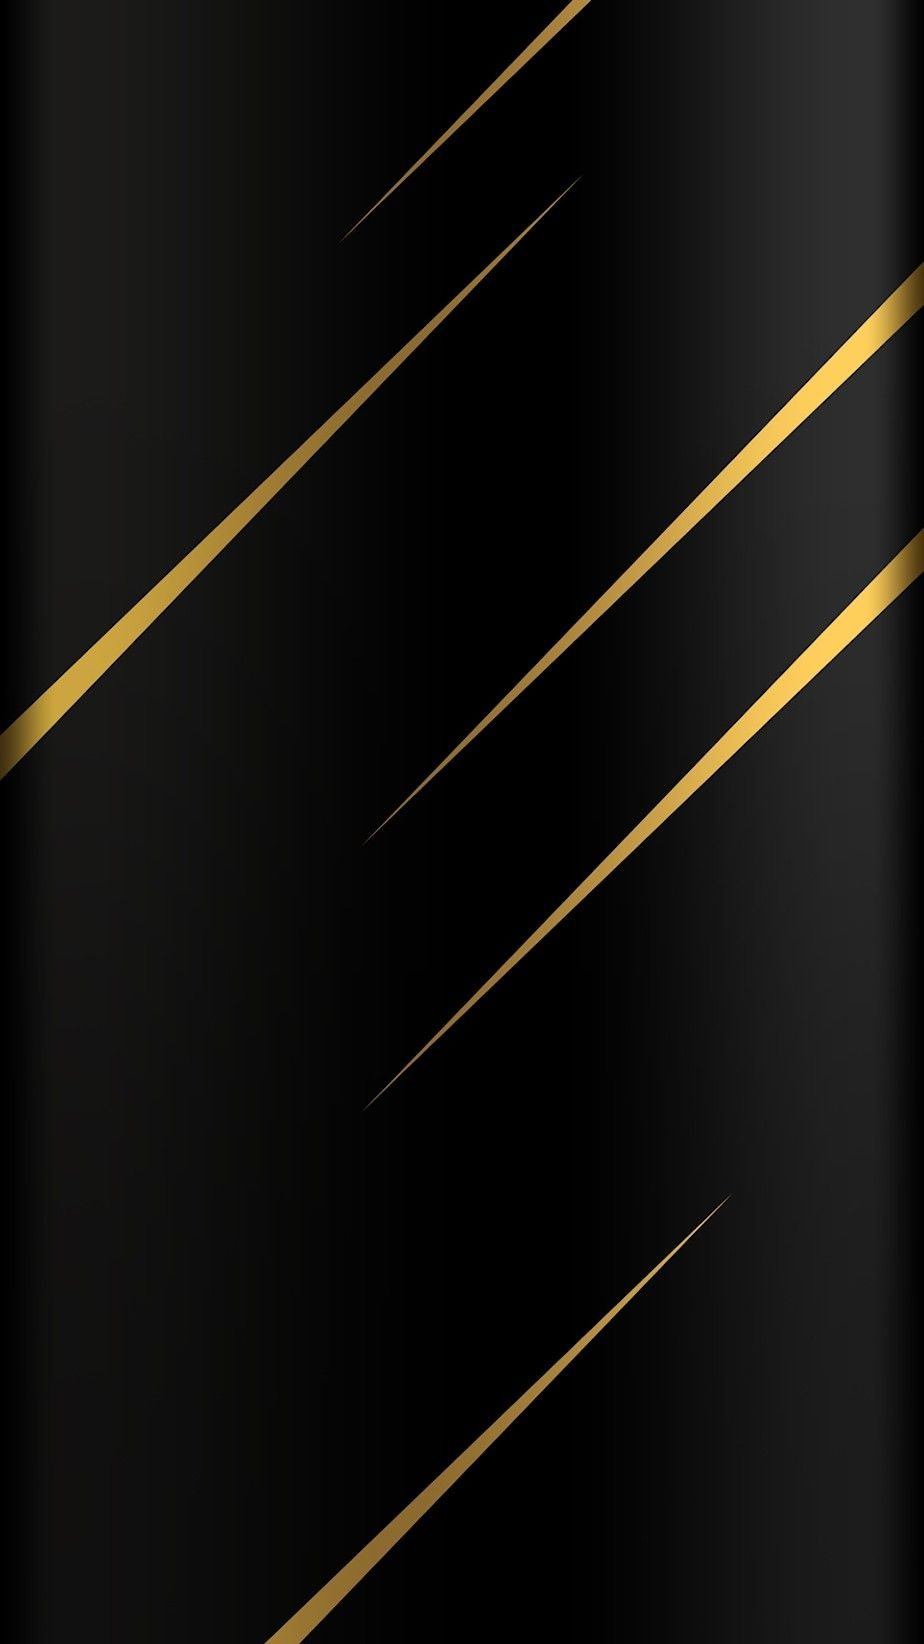 Pin by zryan sharif on wallpaper phone pinterest for Black gold wallpaper designs